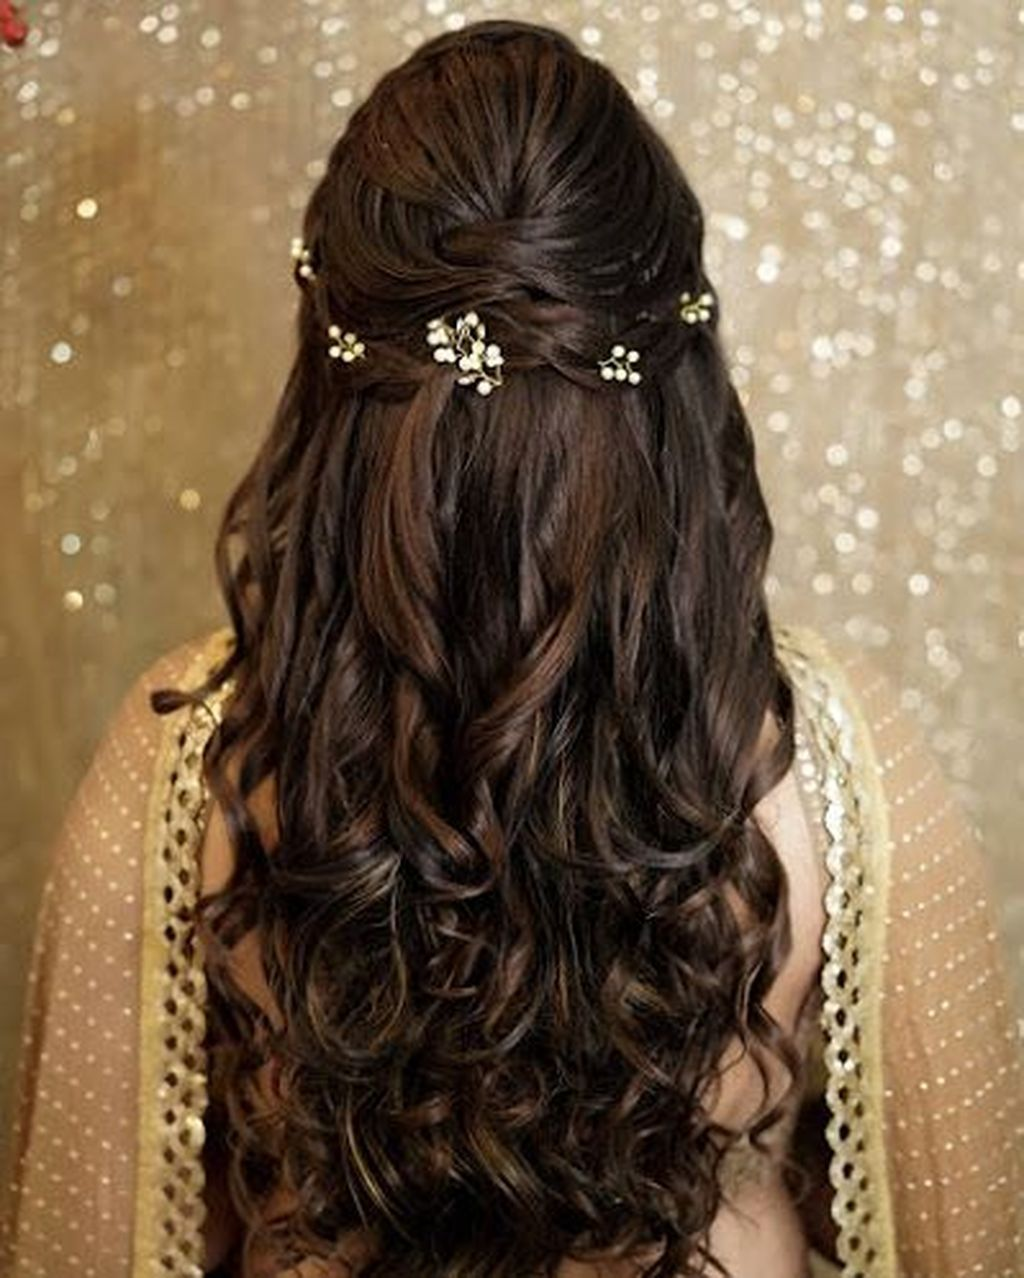 Elegant Wedding Hairstyle Idea: 39 Elegant Bridal Hairstyles Ideas For Long Hair (With